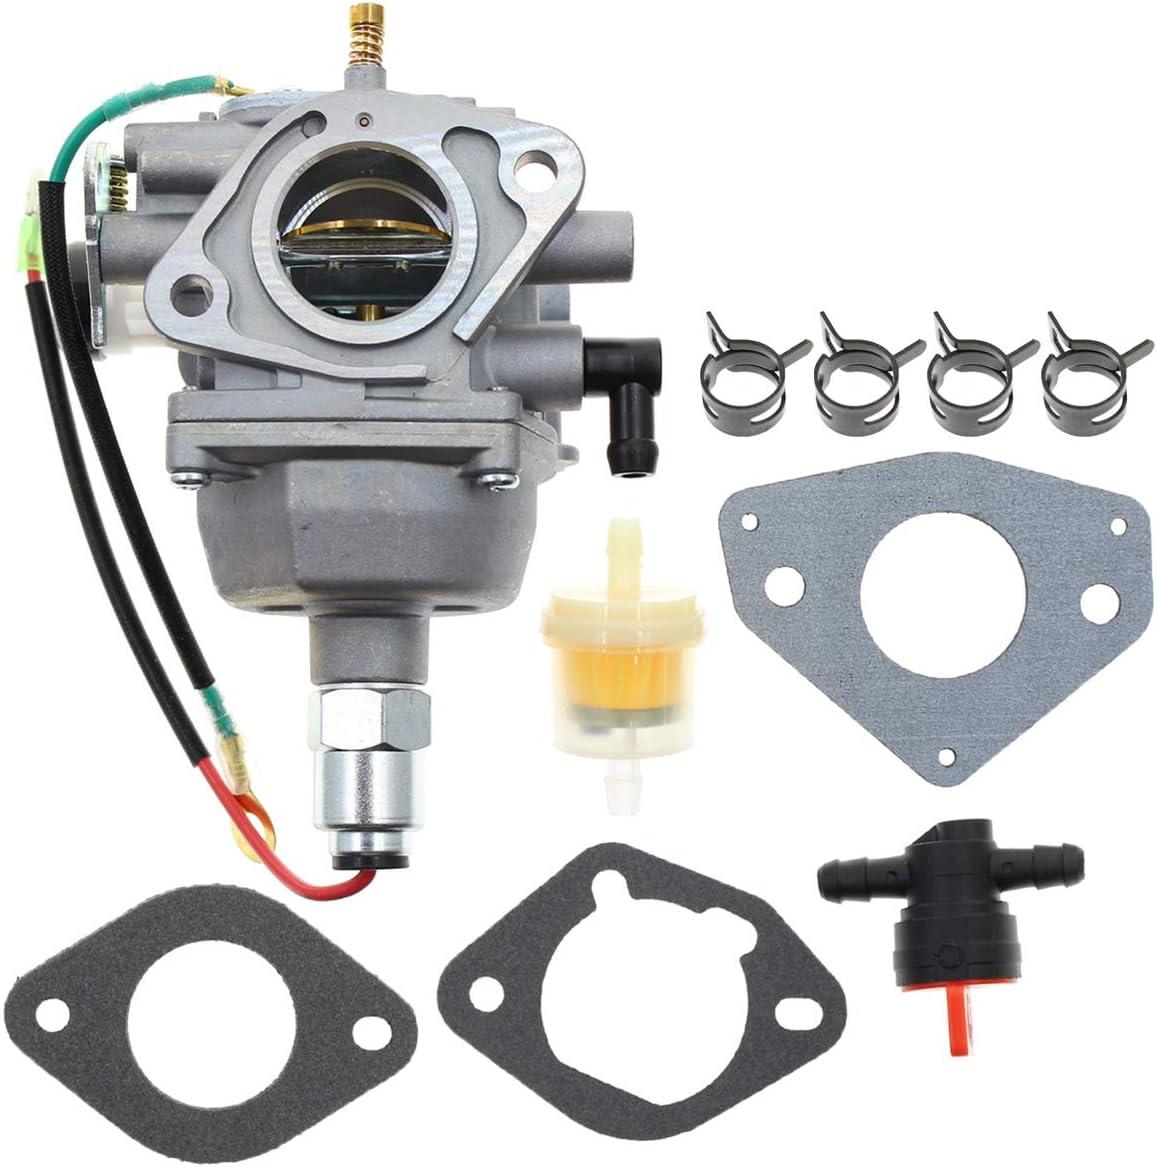 Carbhub 32 853 08-S Carburetor for Kohler SV710 SV725 SV730 SV735 SV740 SV830 Courage Engine Motor Craftsman Lawn Mower Tractor Toro 59008 74375 74823 Replaces 32-853-12-S 32 853 08-S